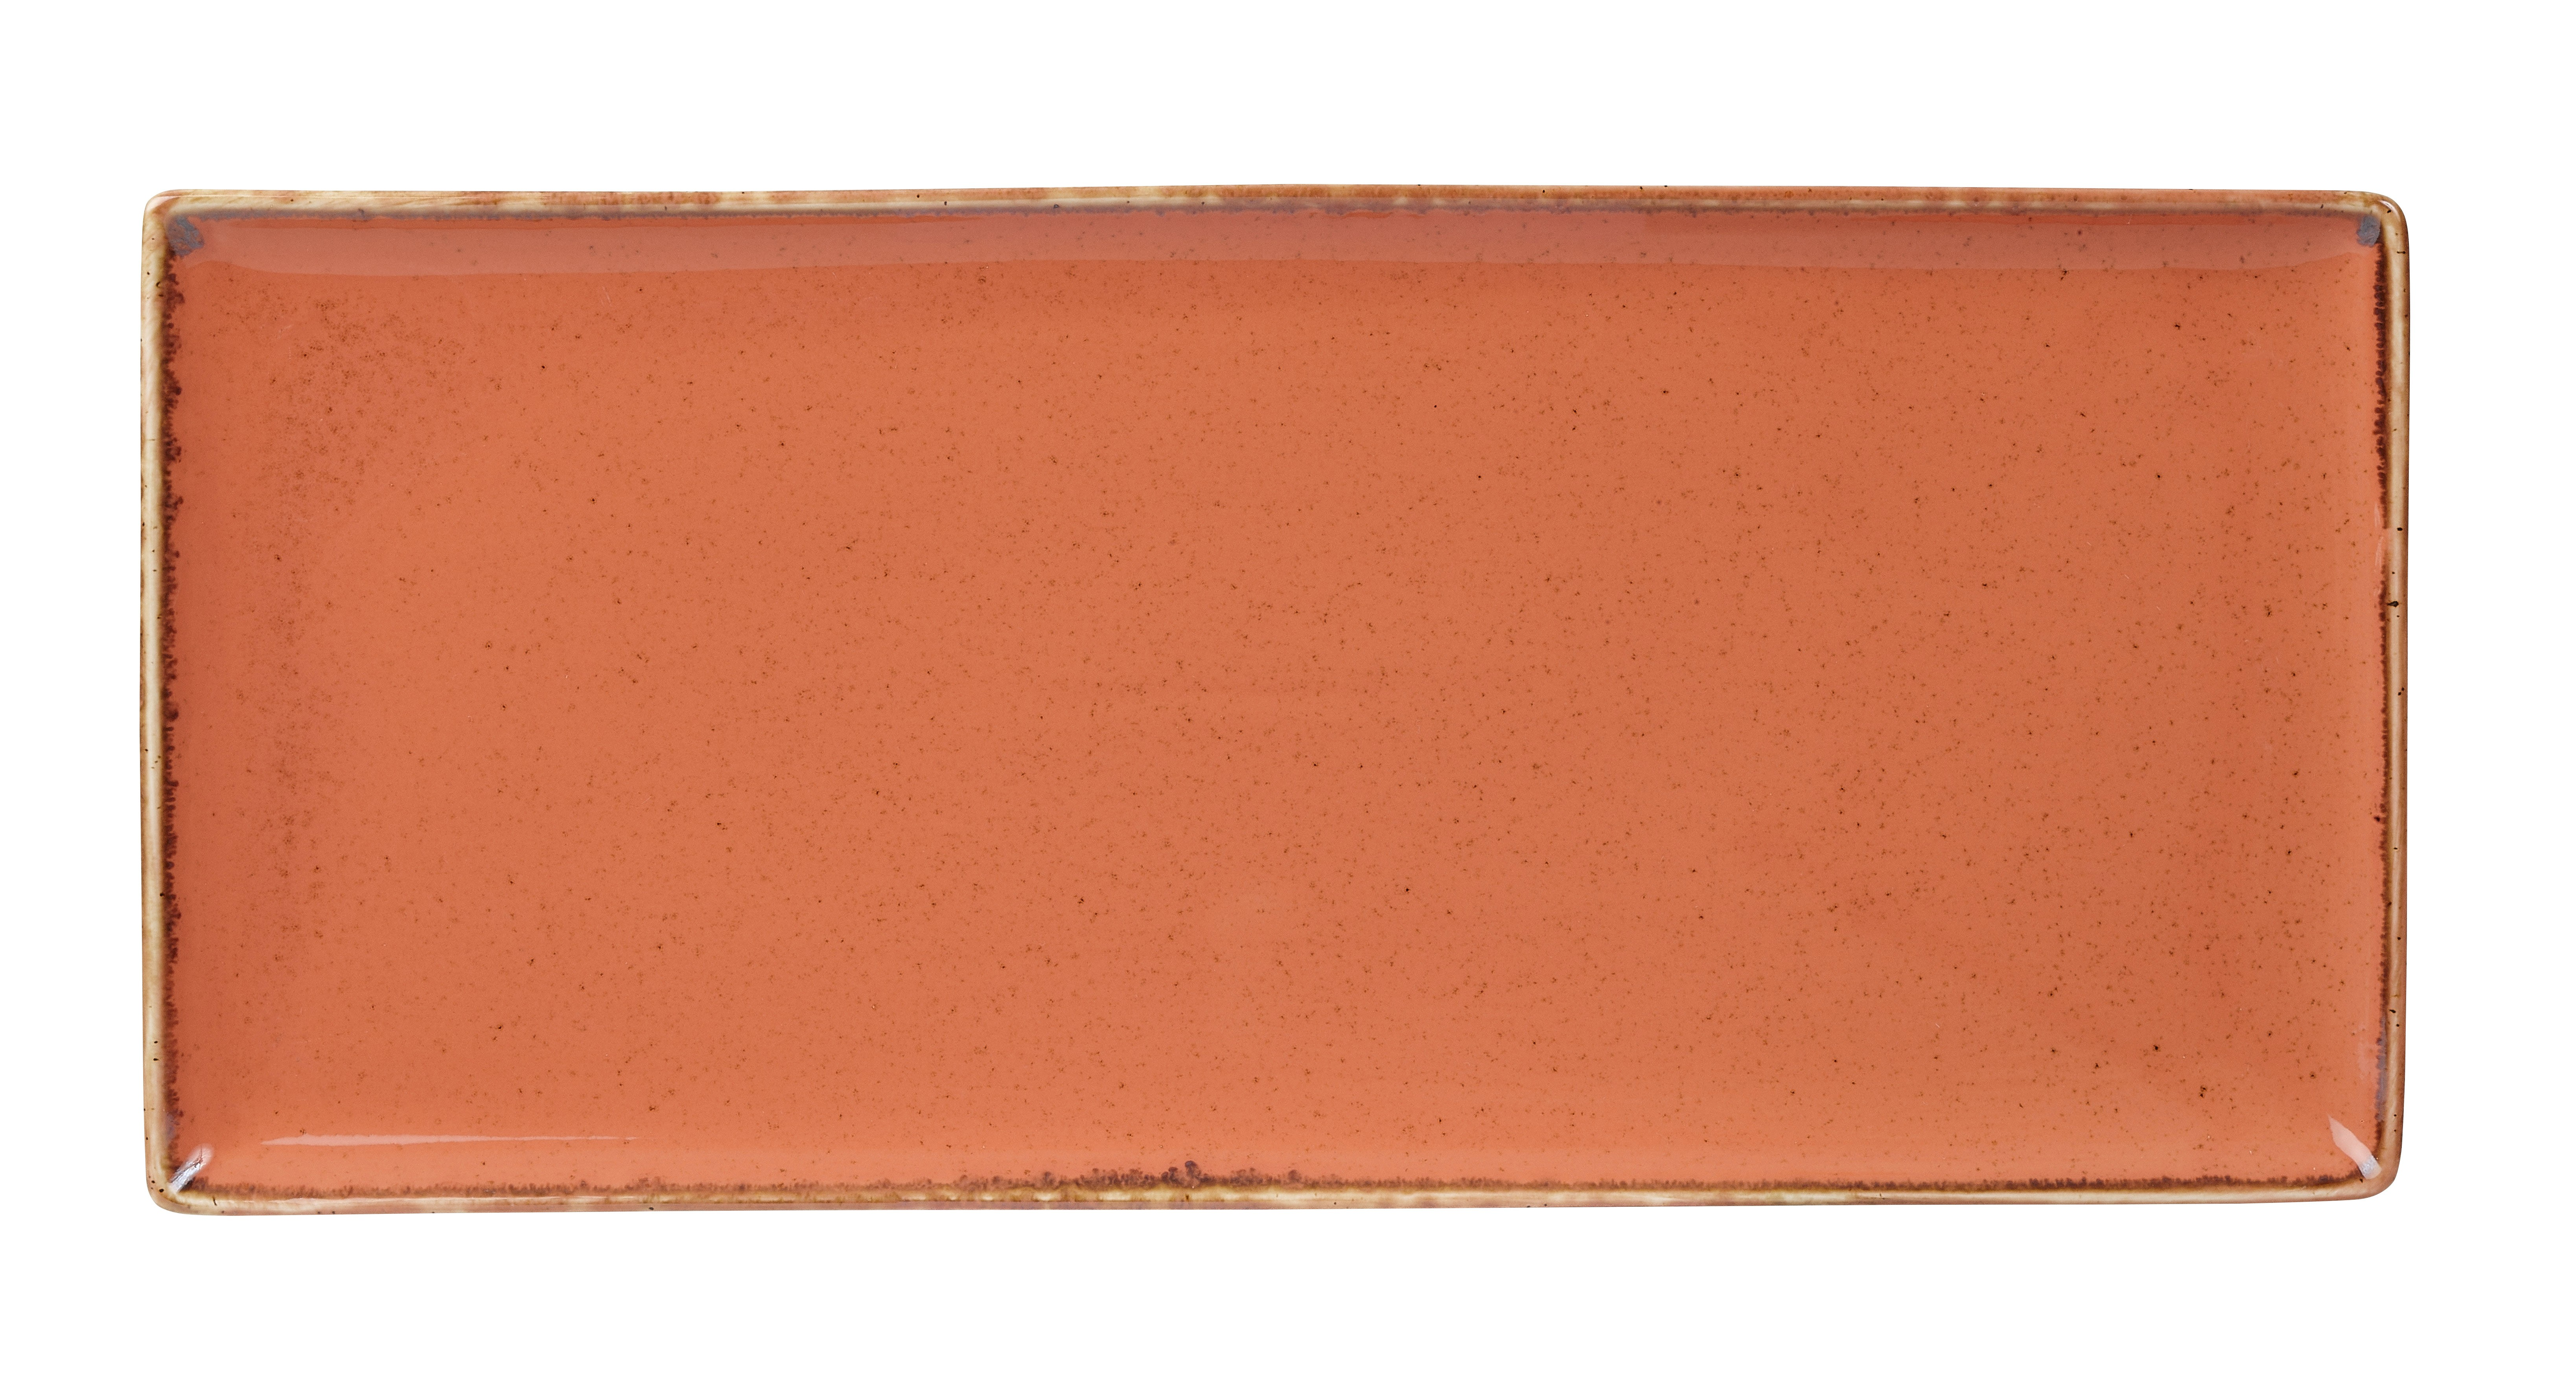 "Coral rectangular Plato 35x15.5cm / 13.75 ""x 6"""